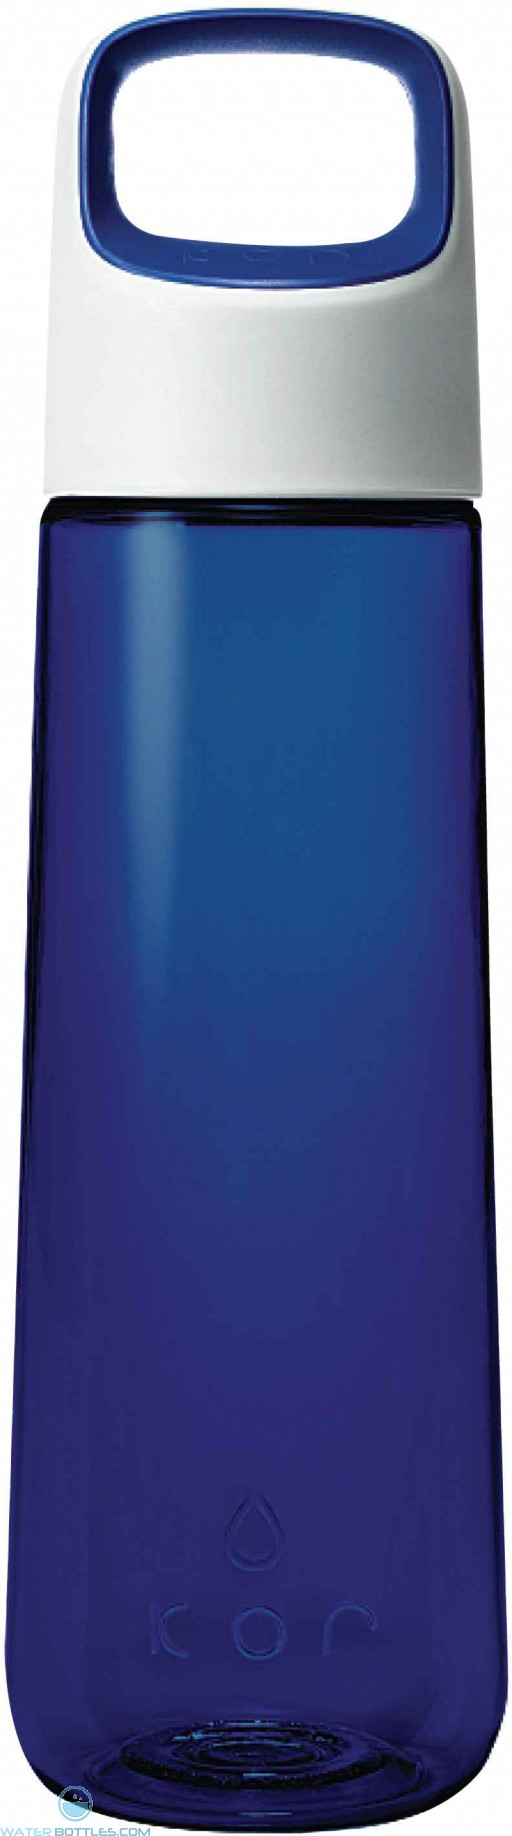 KOR Aura Bottles | 25 oz - Cobalt Blue